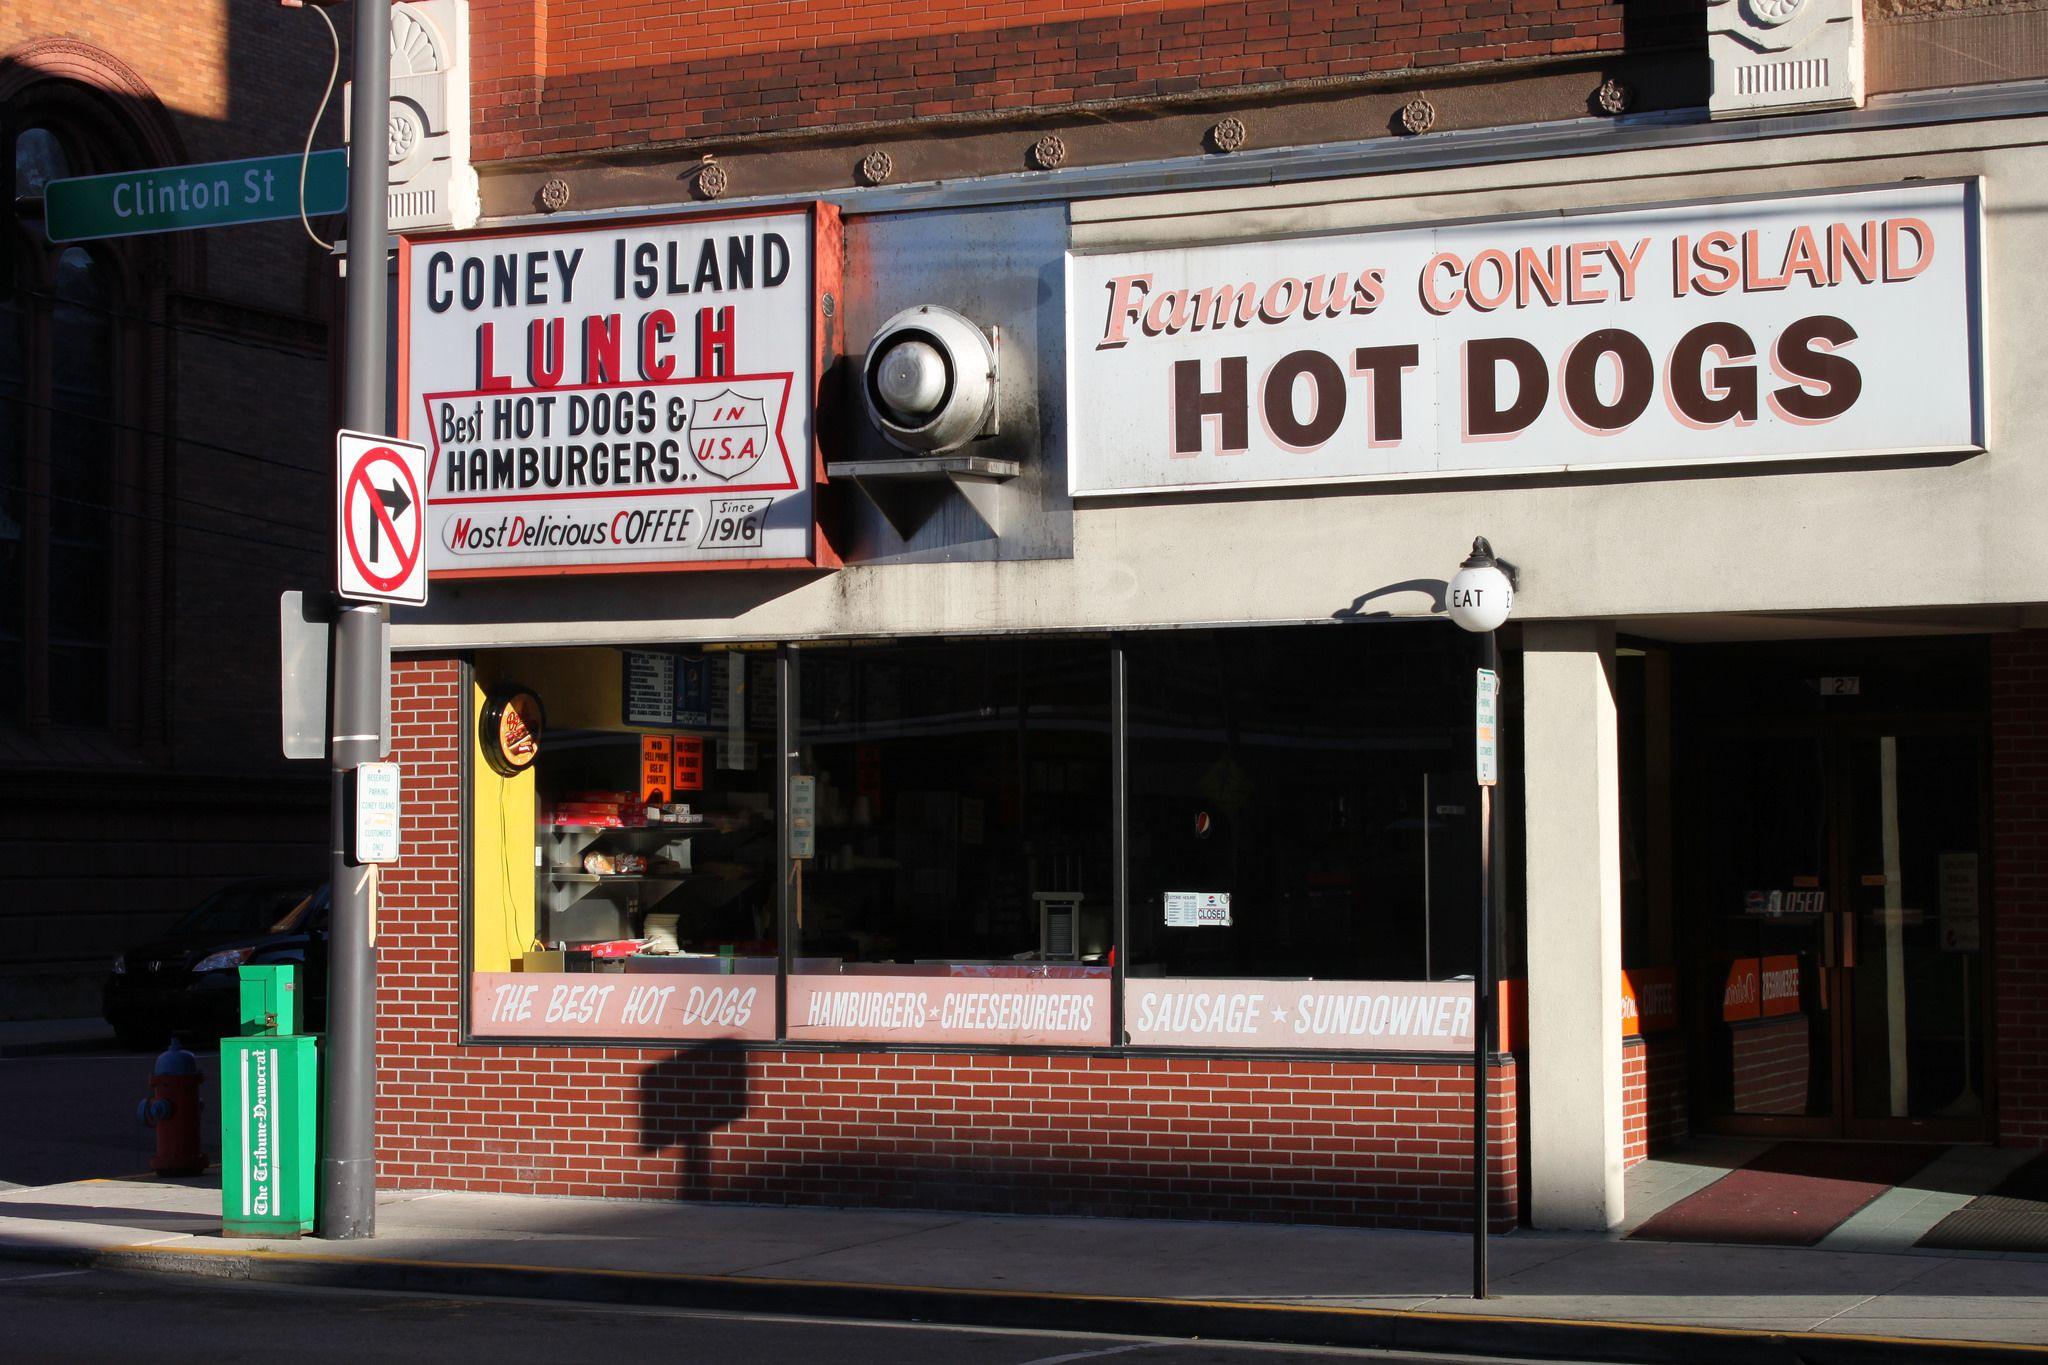 Coney Island Lunch Johnstown Pa Coney Island Johnstown Island